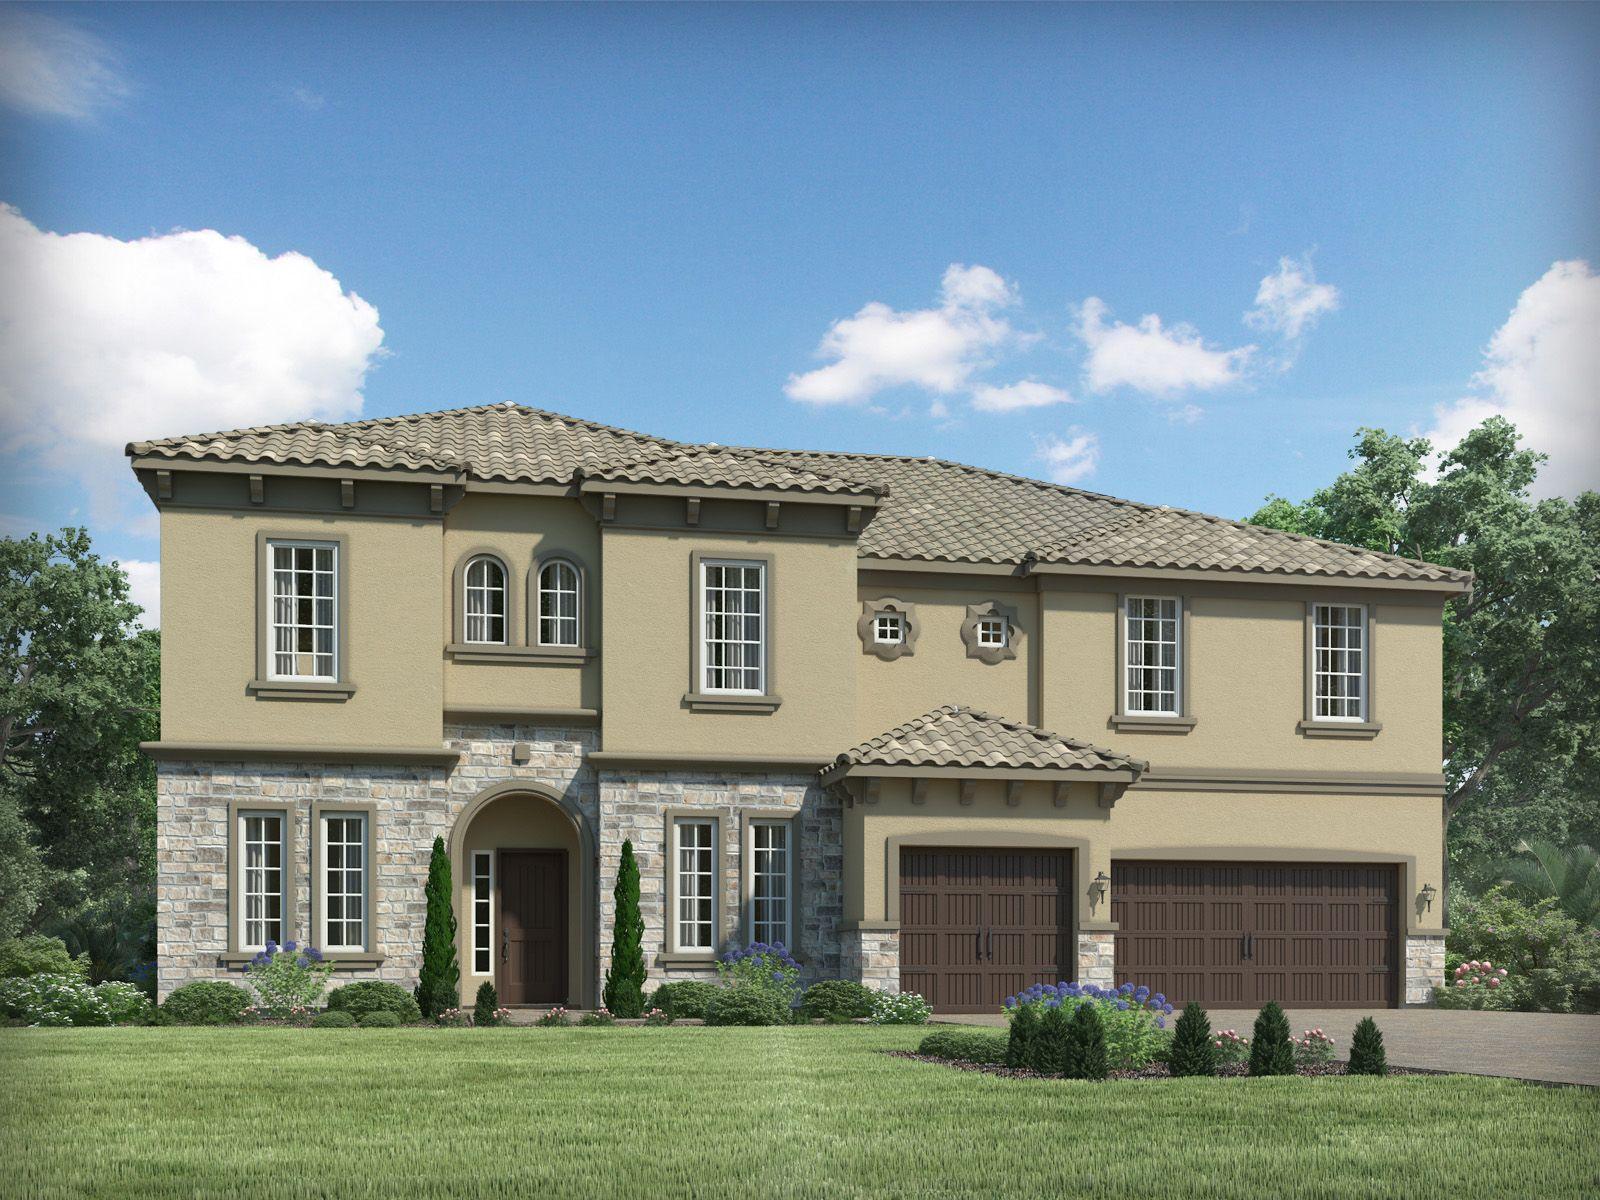 3258 MEDINA COURT, Oviedo, FL Homes & Land - Real Estate